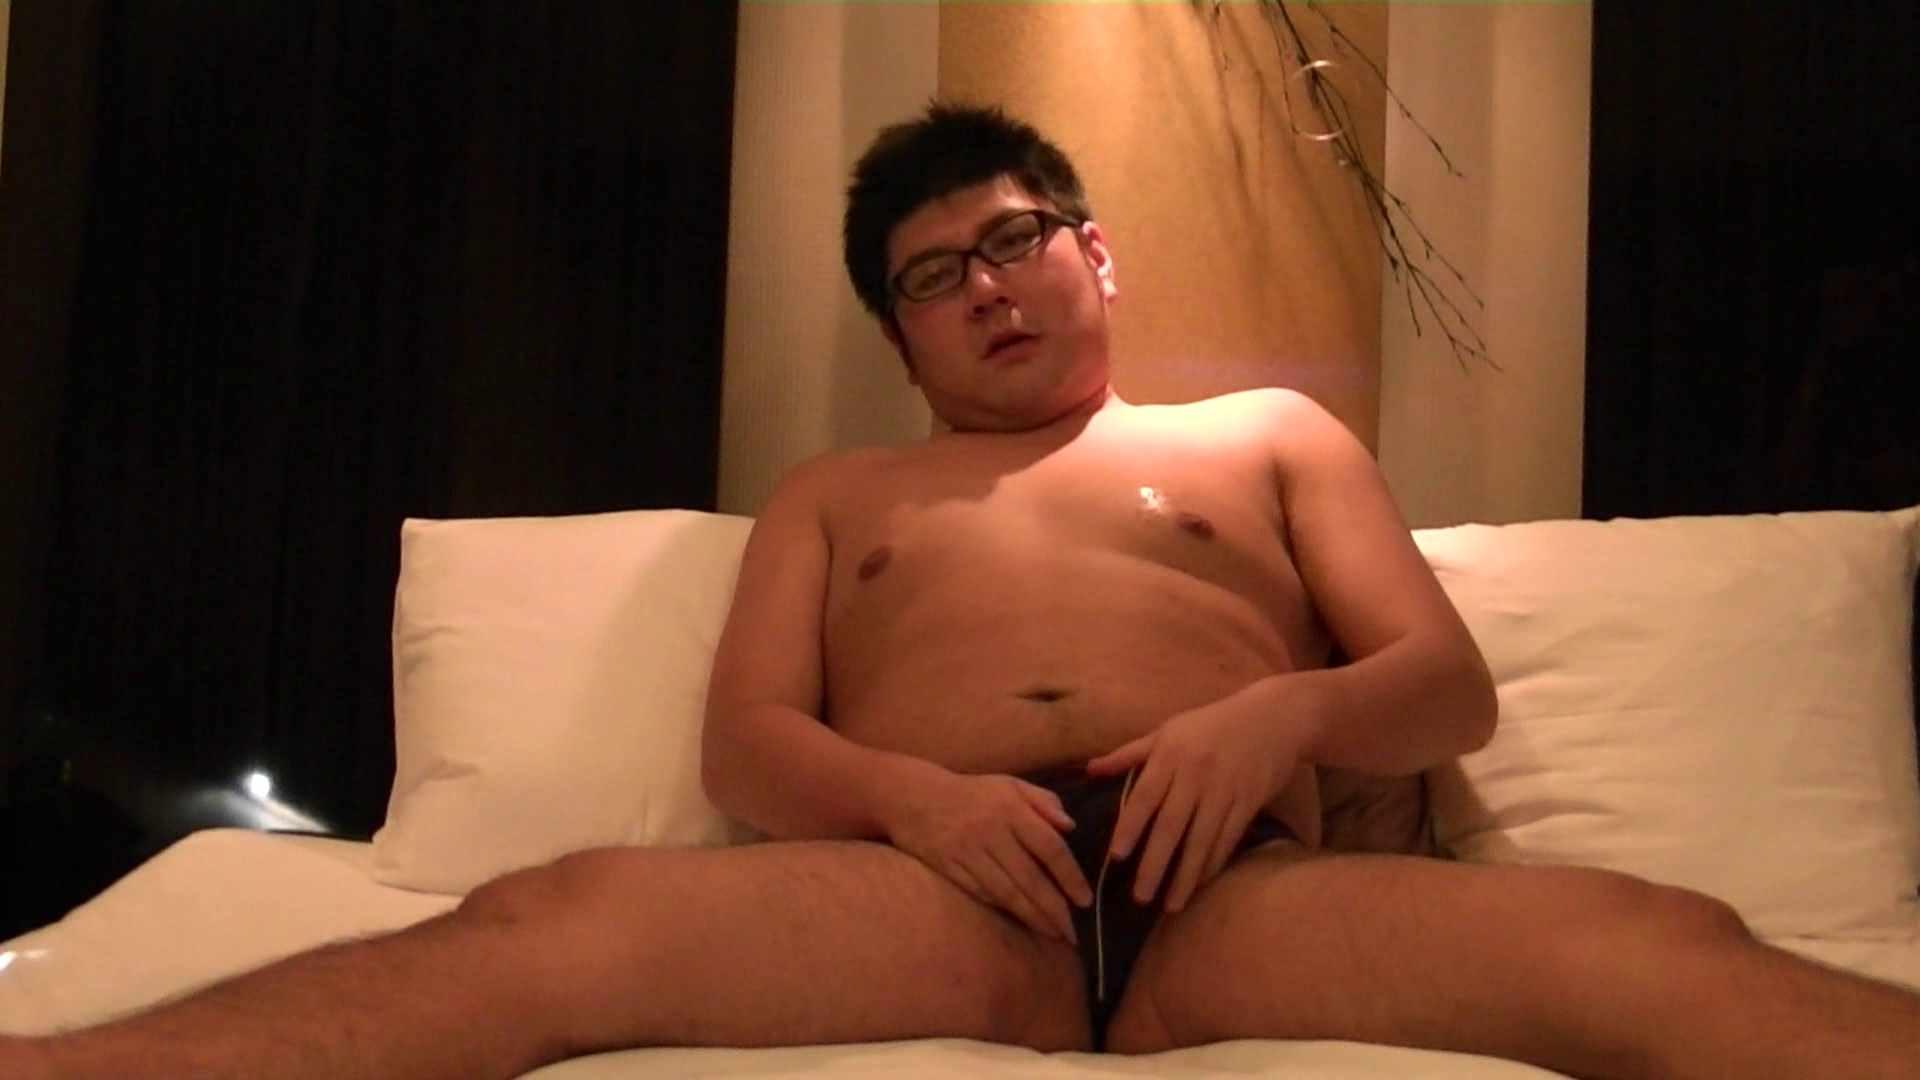 Mr.オナックスさん投稿!HD 貴方のオナニー三万円で撮影させてください。VOL.02 前編 0 | オナニー特集  72pic 33